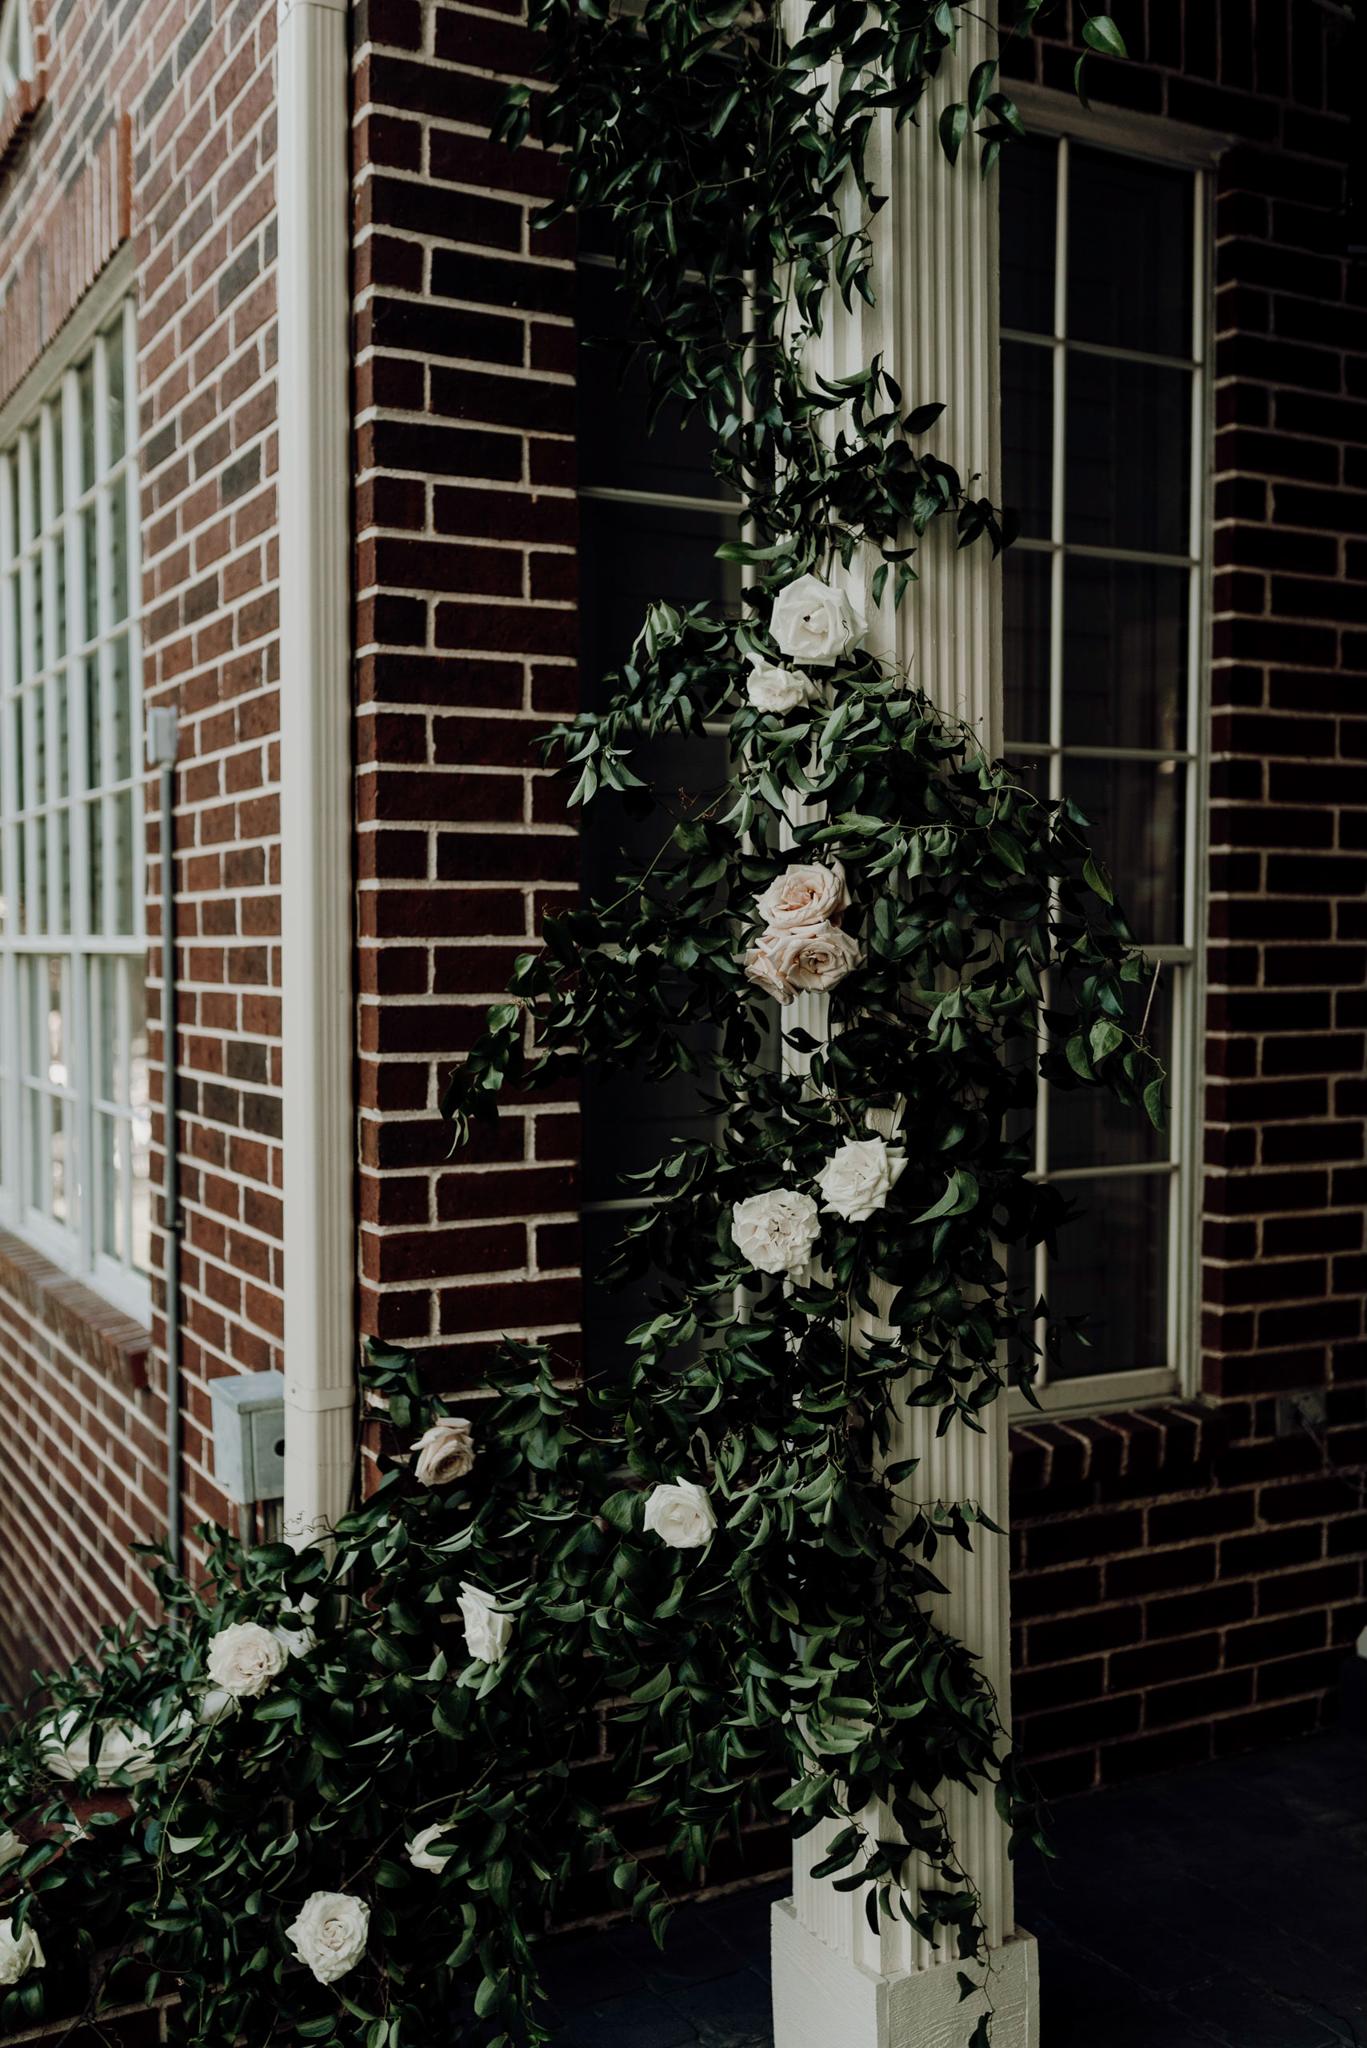 Houston Wedding Photographer-Intimate Texas Backyard Wedding- Houston Wedding Photographer -Kristen Giles Photography-31.jpg